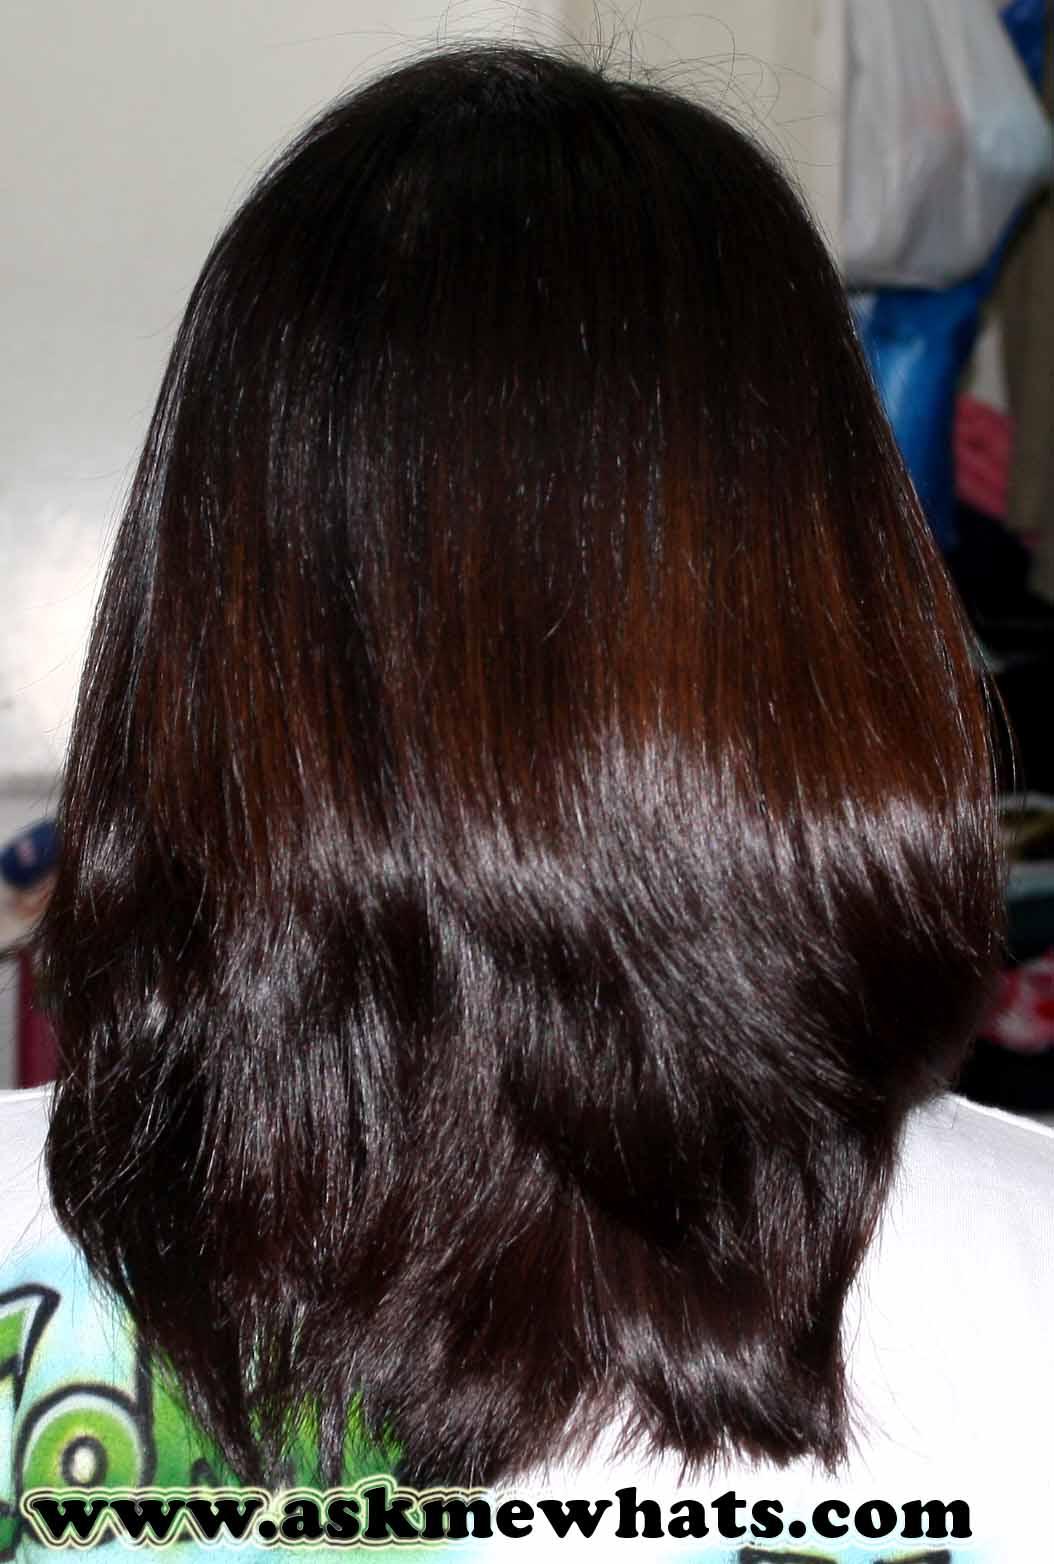 Medium straight hair back view